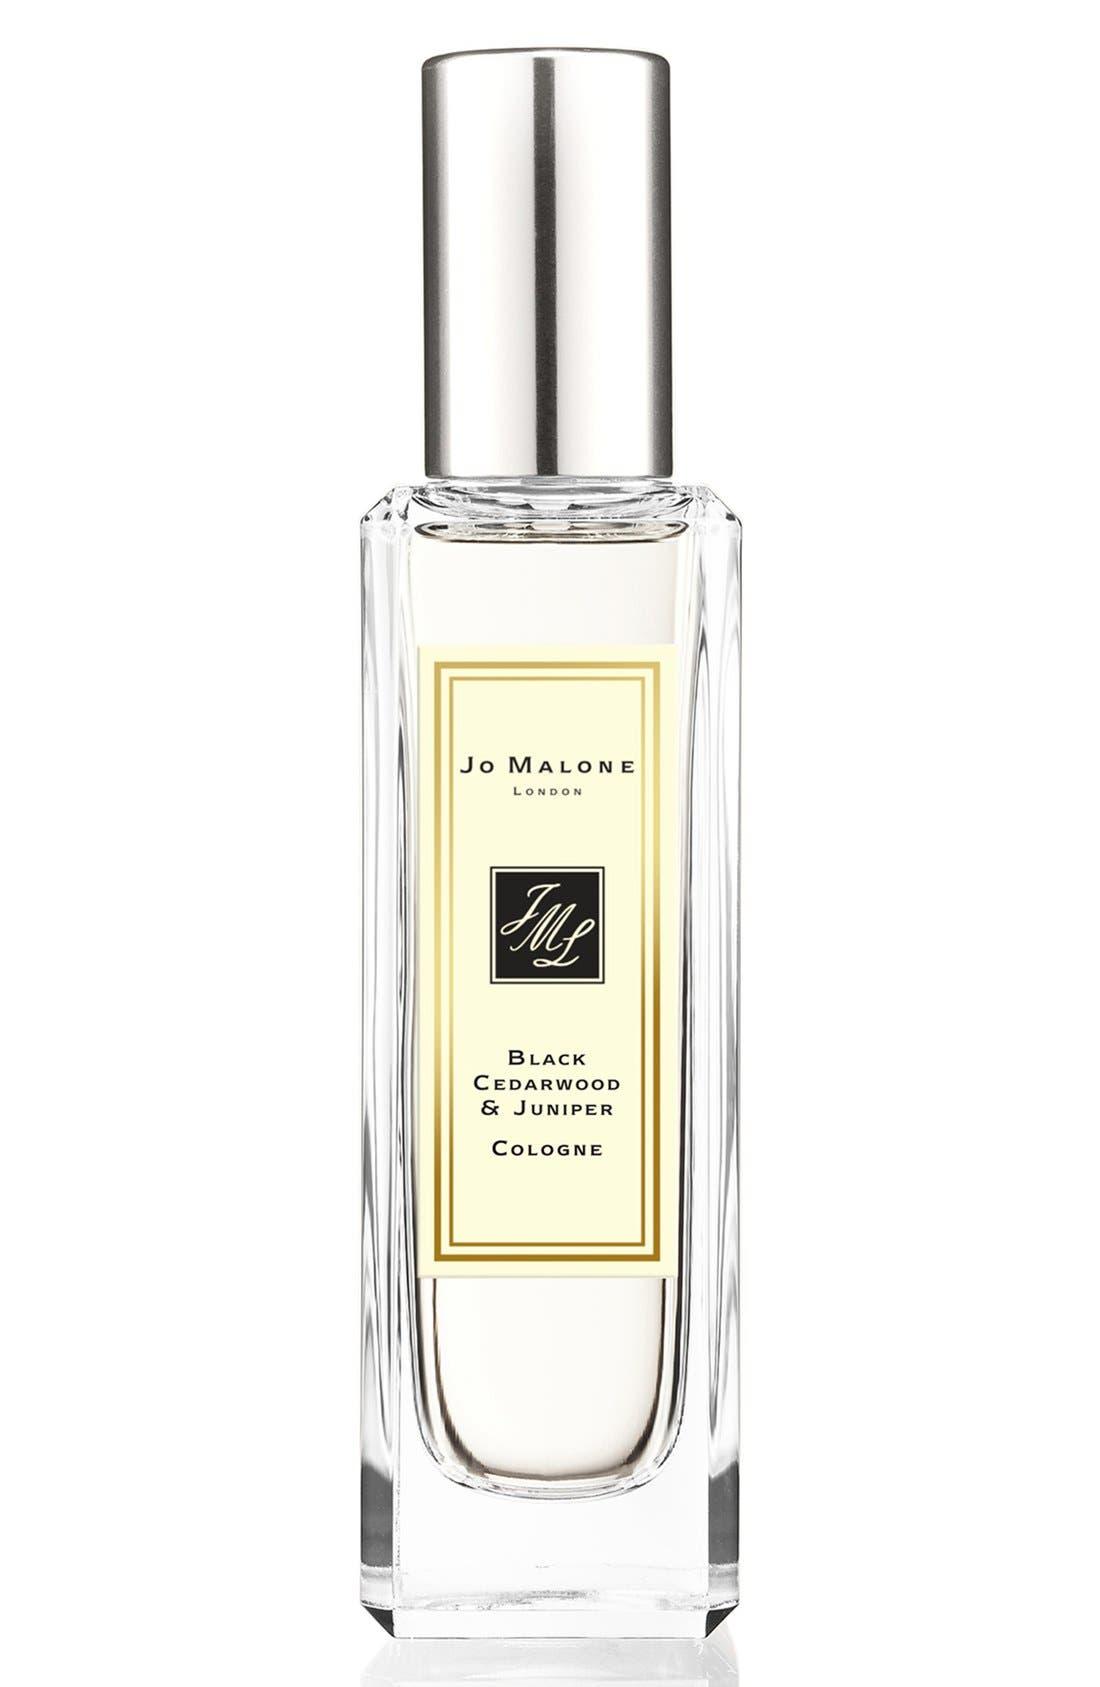 Jo Malone London™ Black Cedarwood & Juniper Cologne (1 oz.)